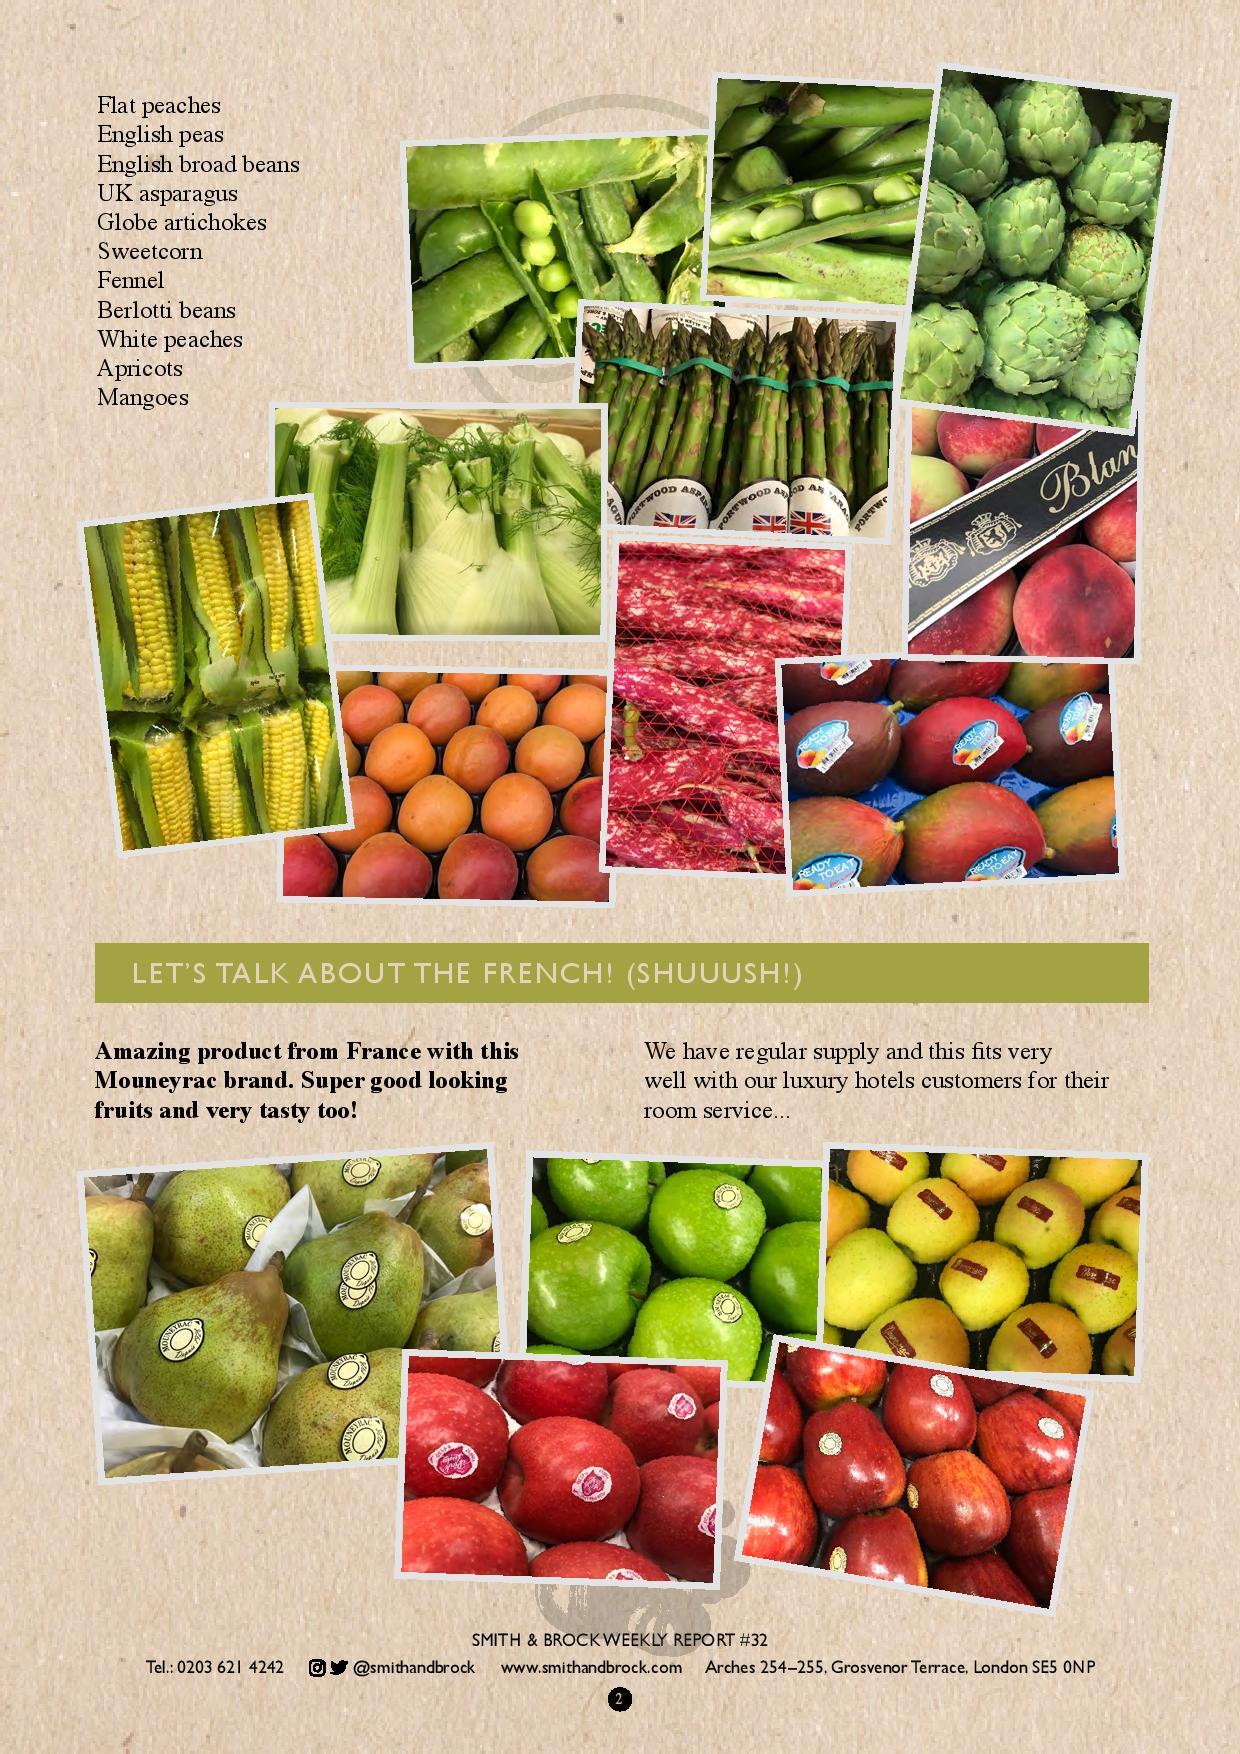 SmithBrock Market Report 011 Jun 2018 #32-page-002